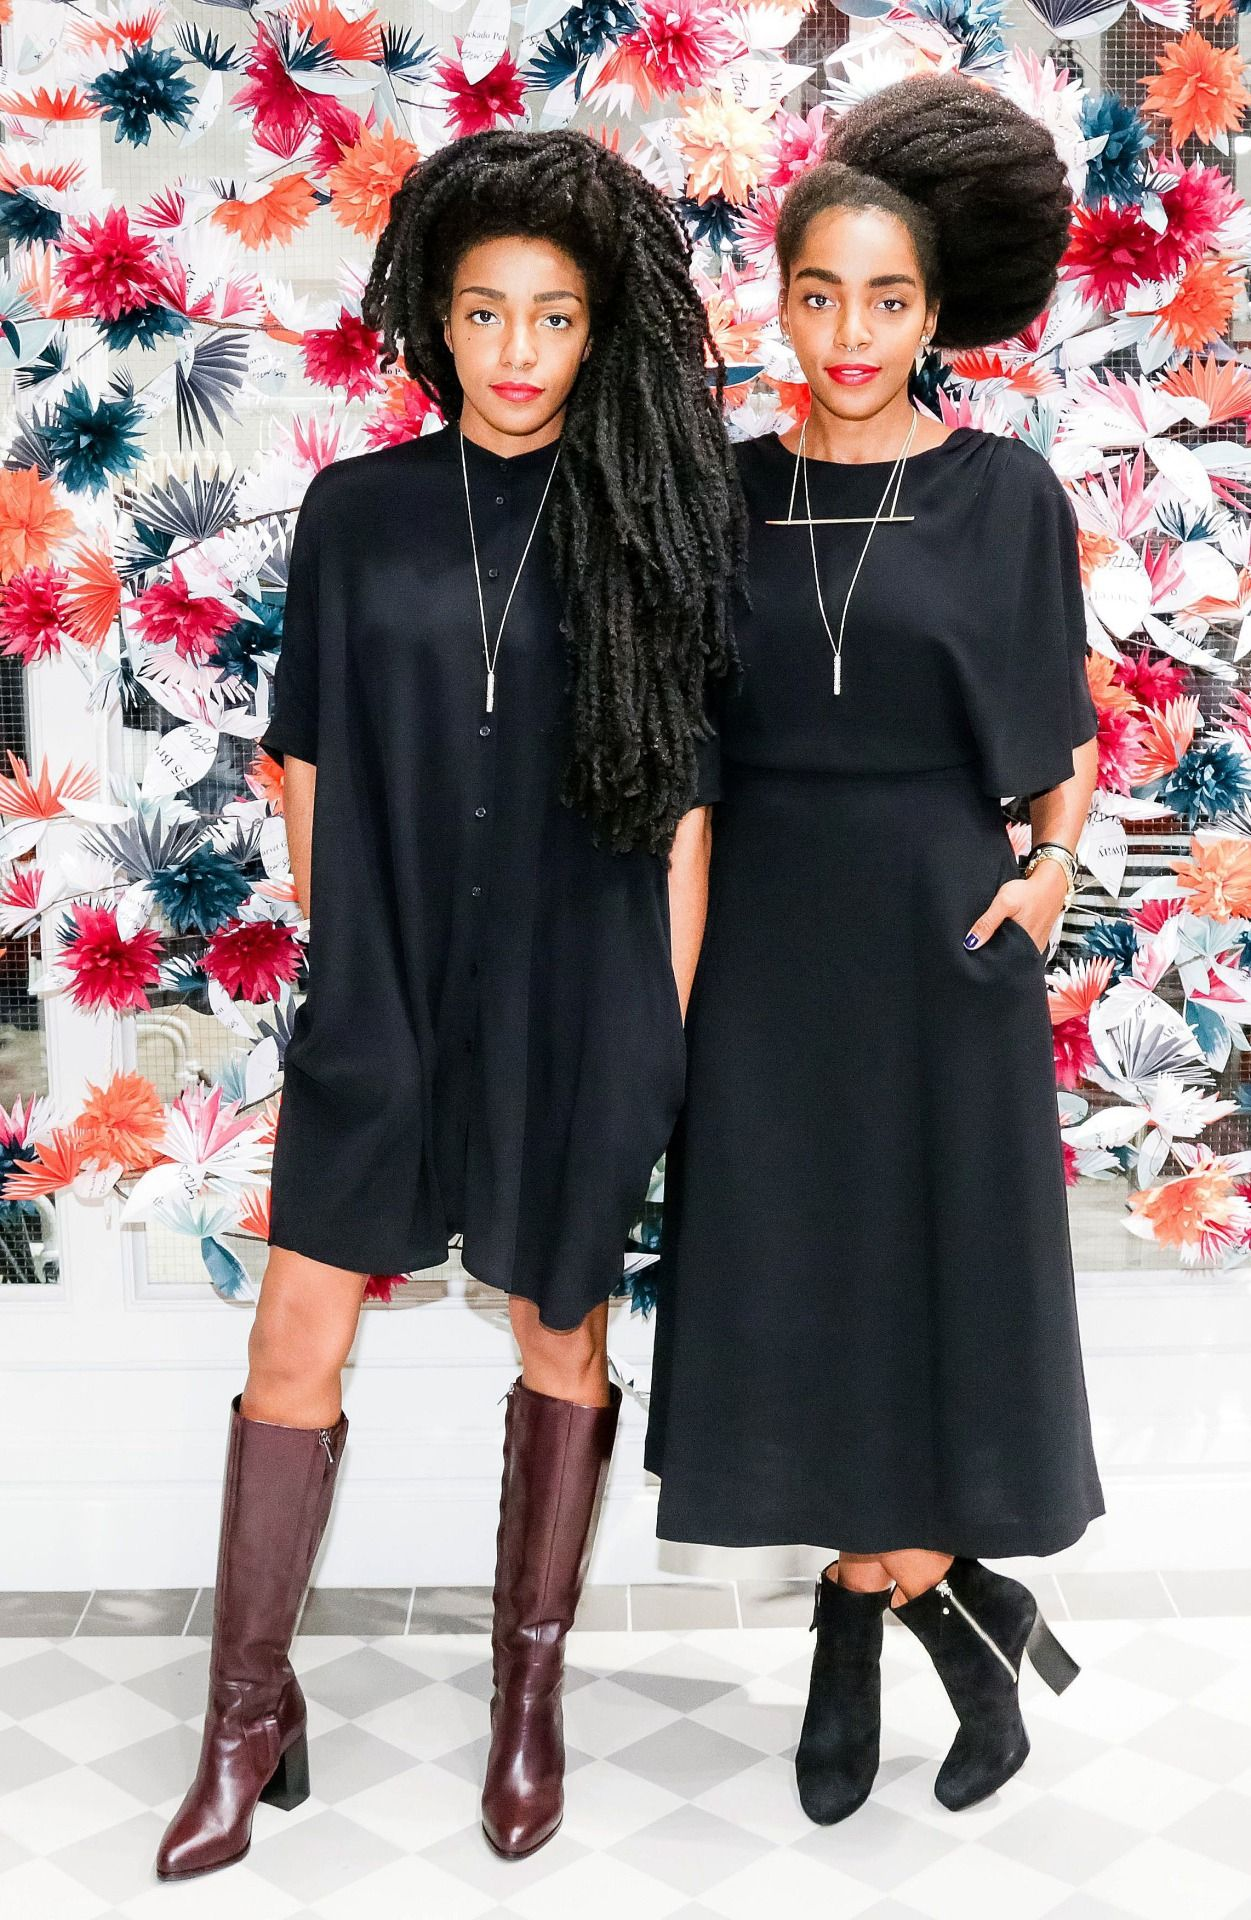 The best of both worlds fashion lvx soror pinterest black